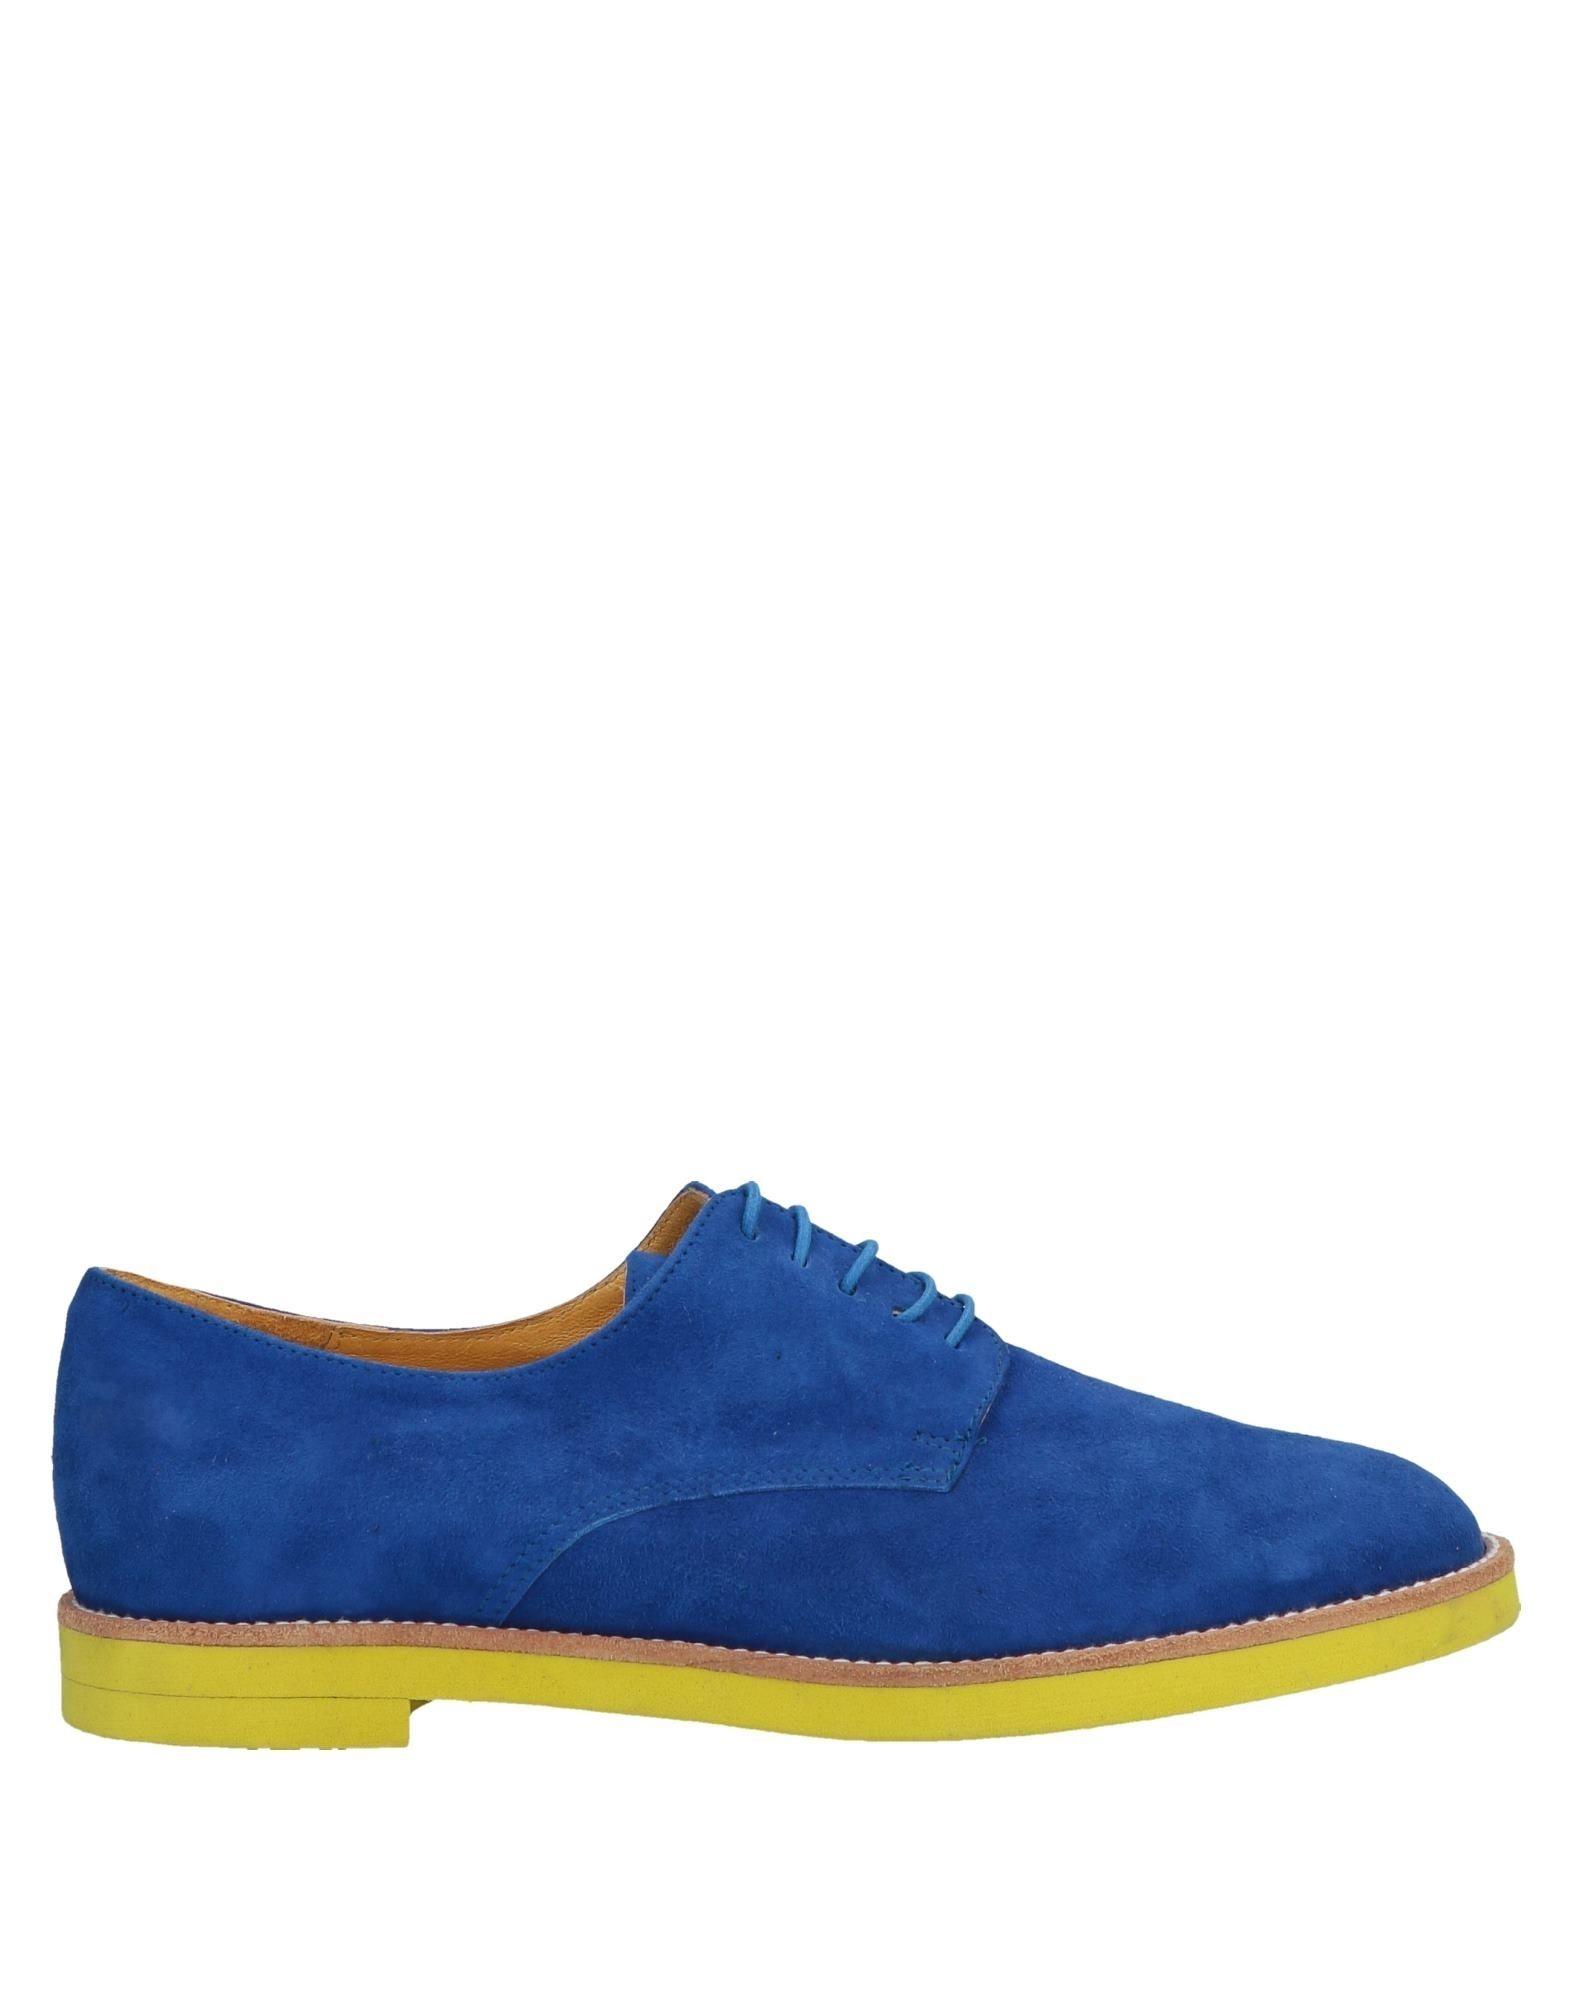 SLACK LONDON Обувь на шнурках crime london обувь на шнурках